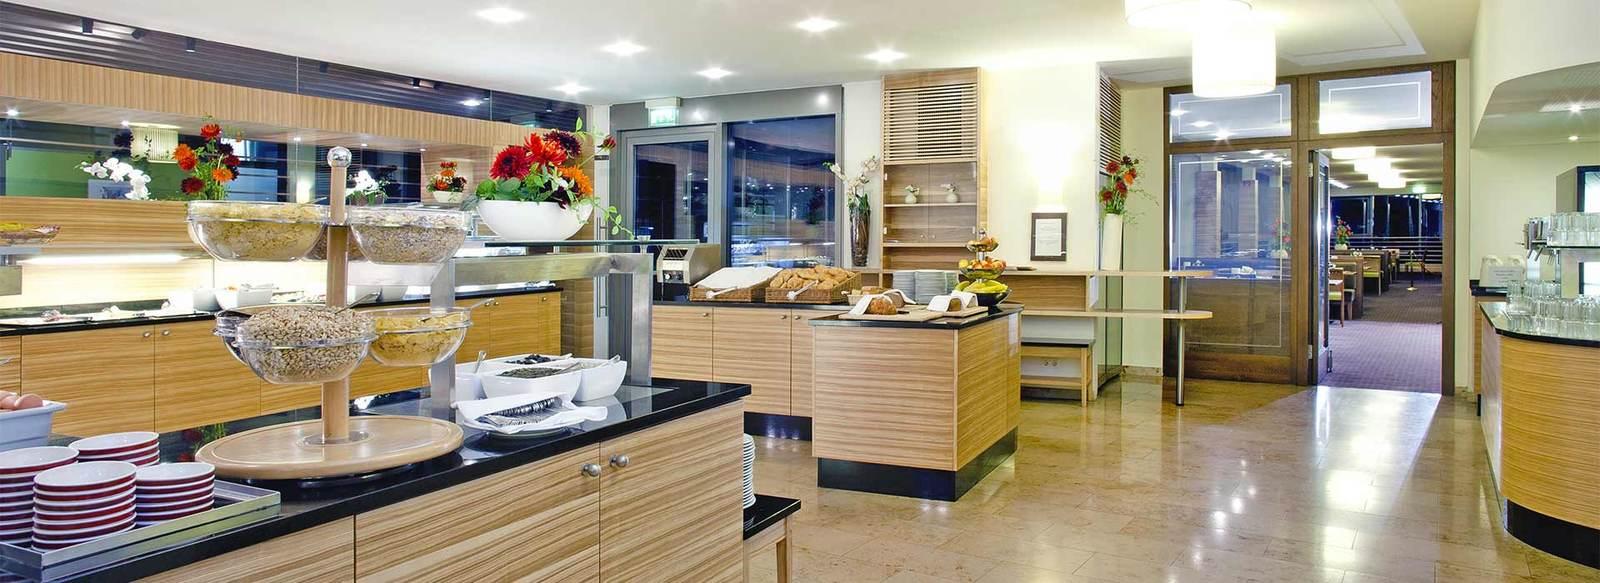 Wellness e buona cucina